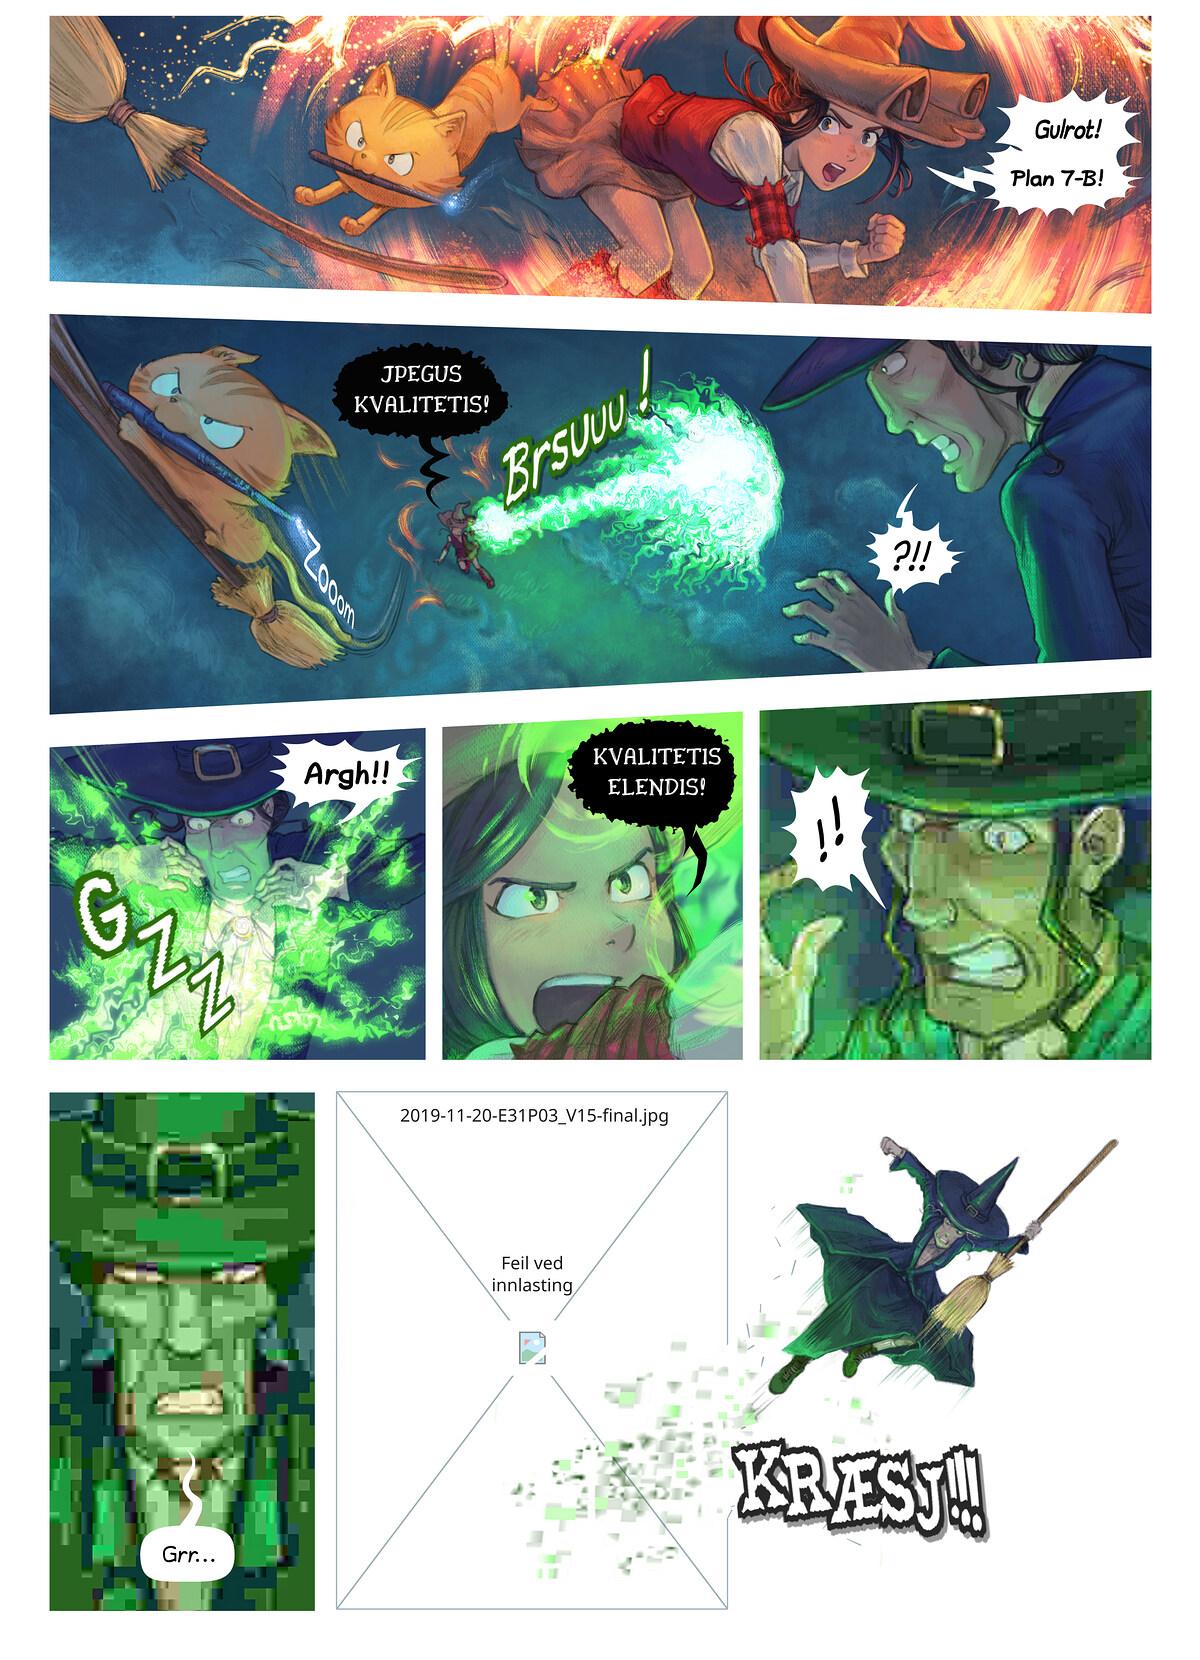 Episode 31: Den store kampen, Page 3